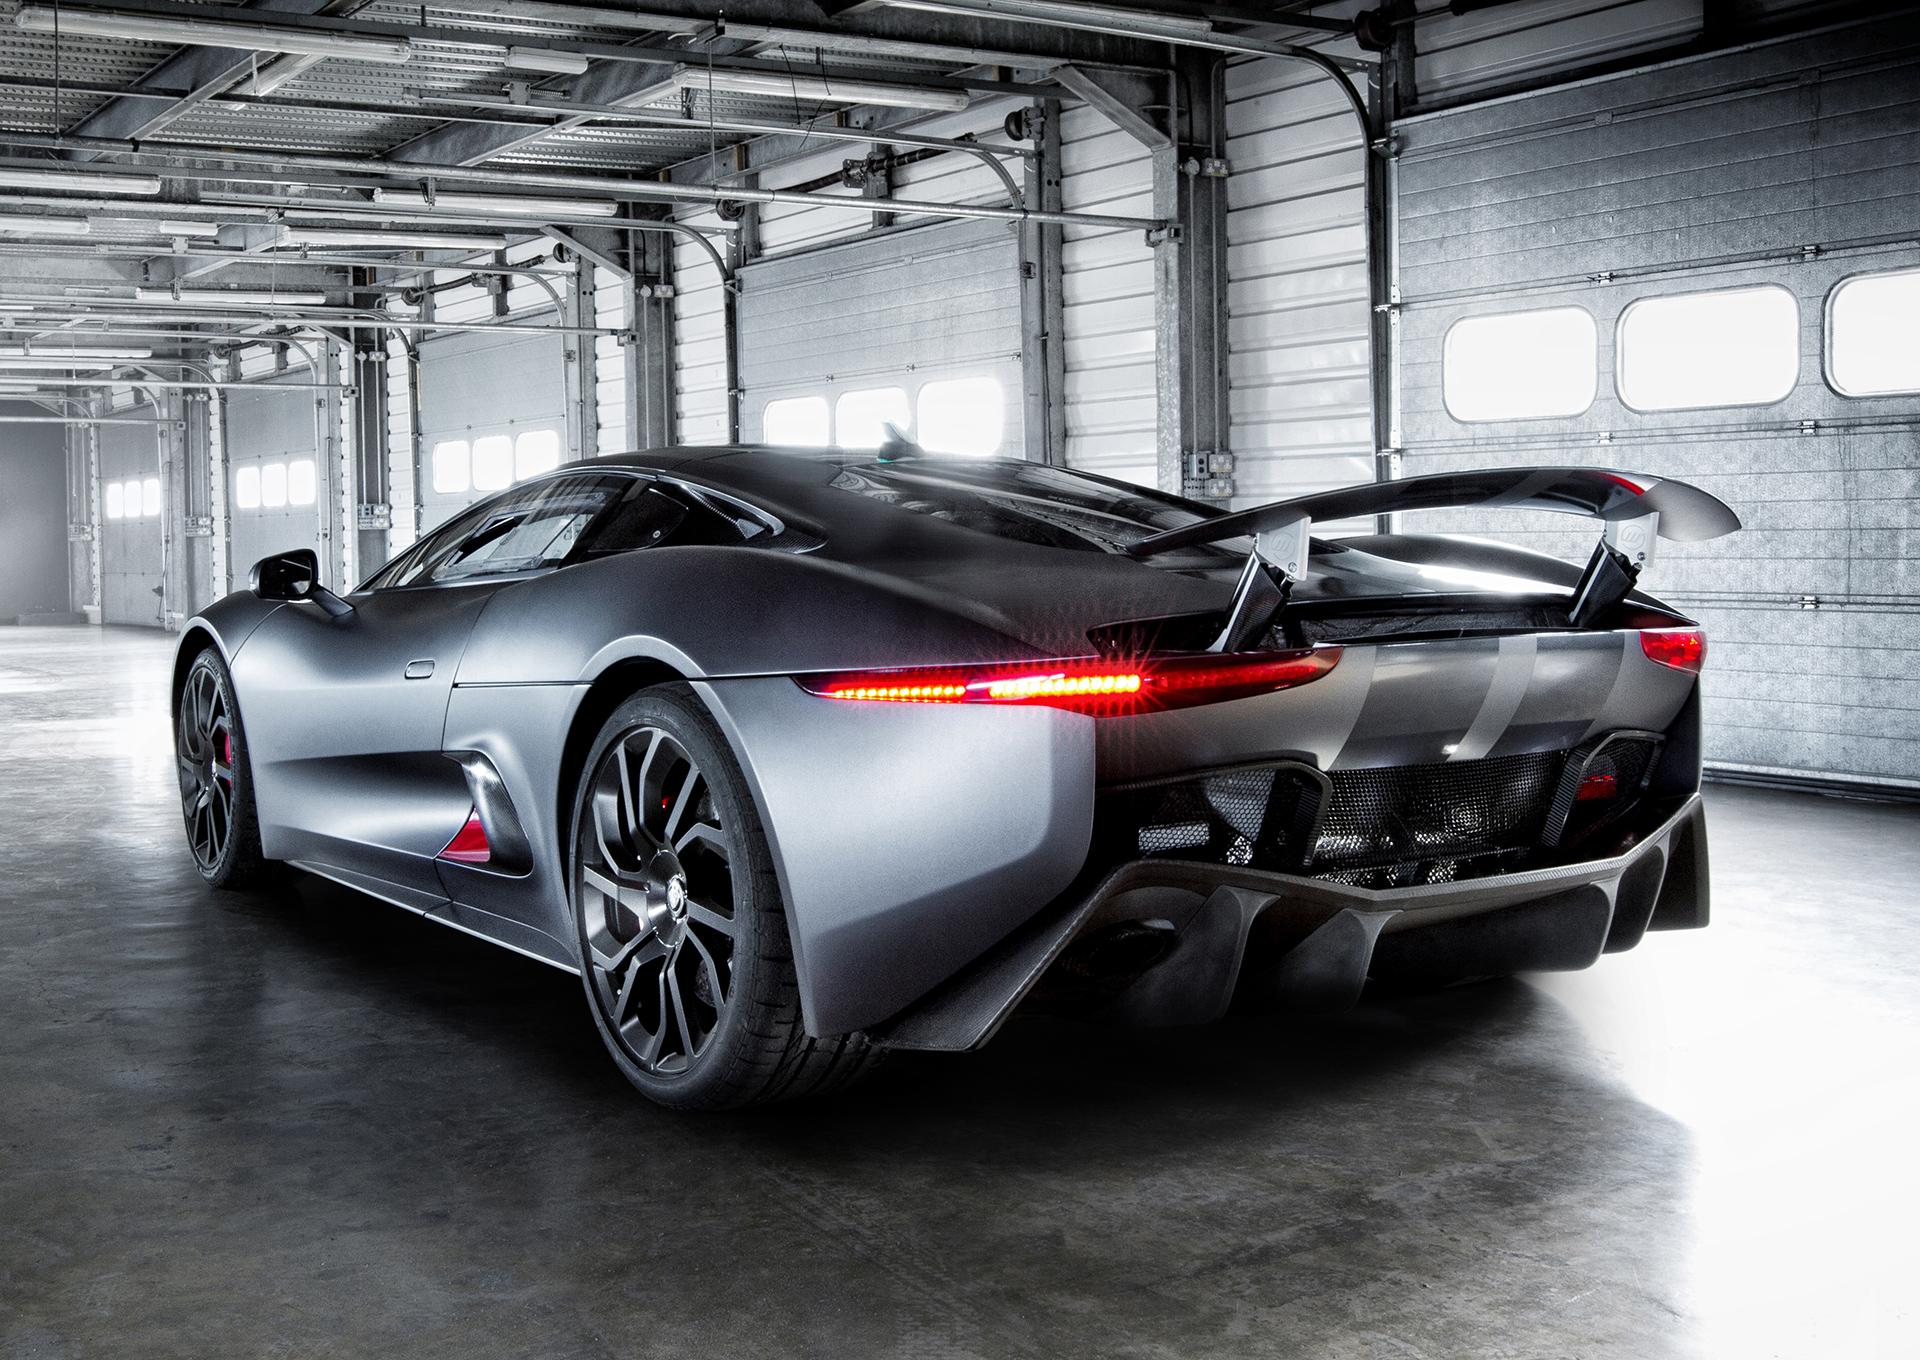 Jaguar C Hybrid Supercar Prototype Showcases Technology Of The